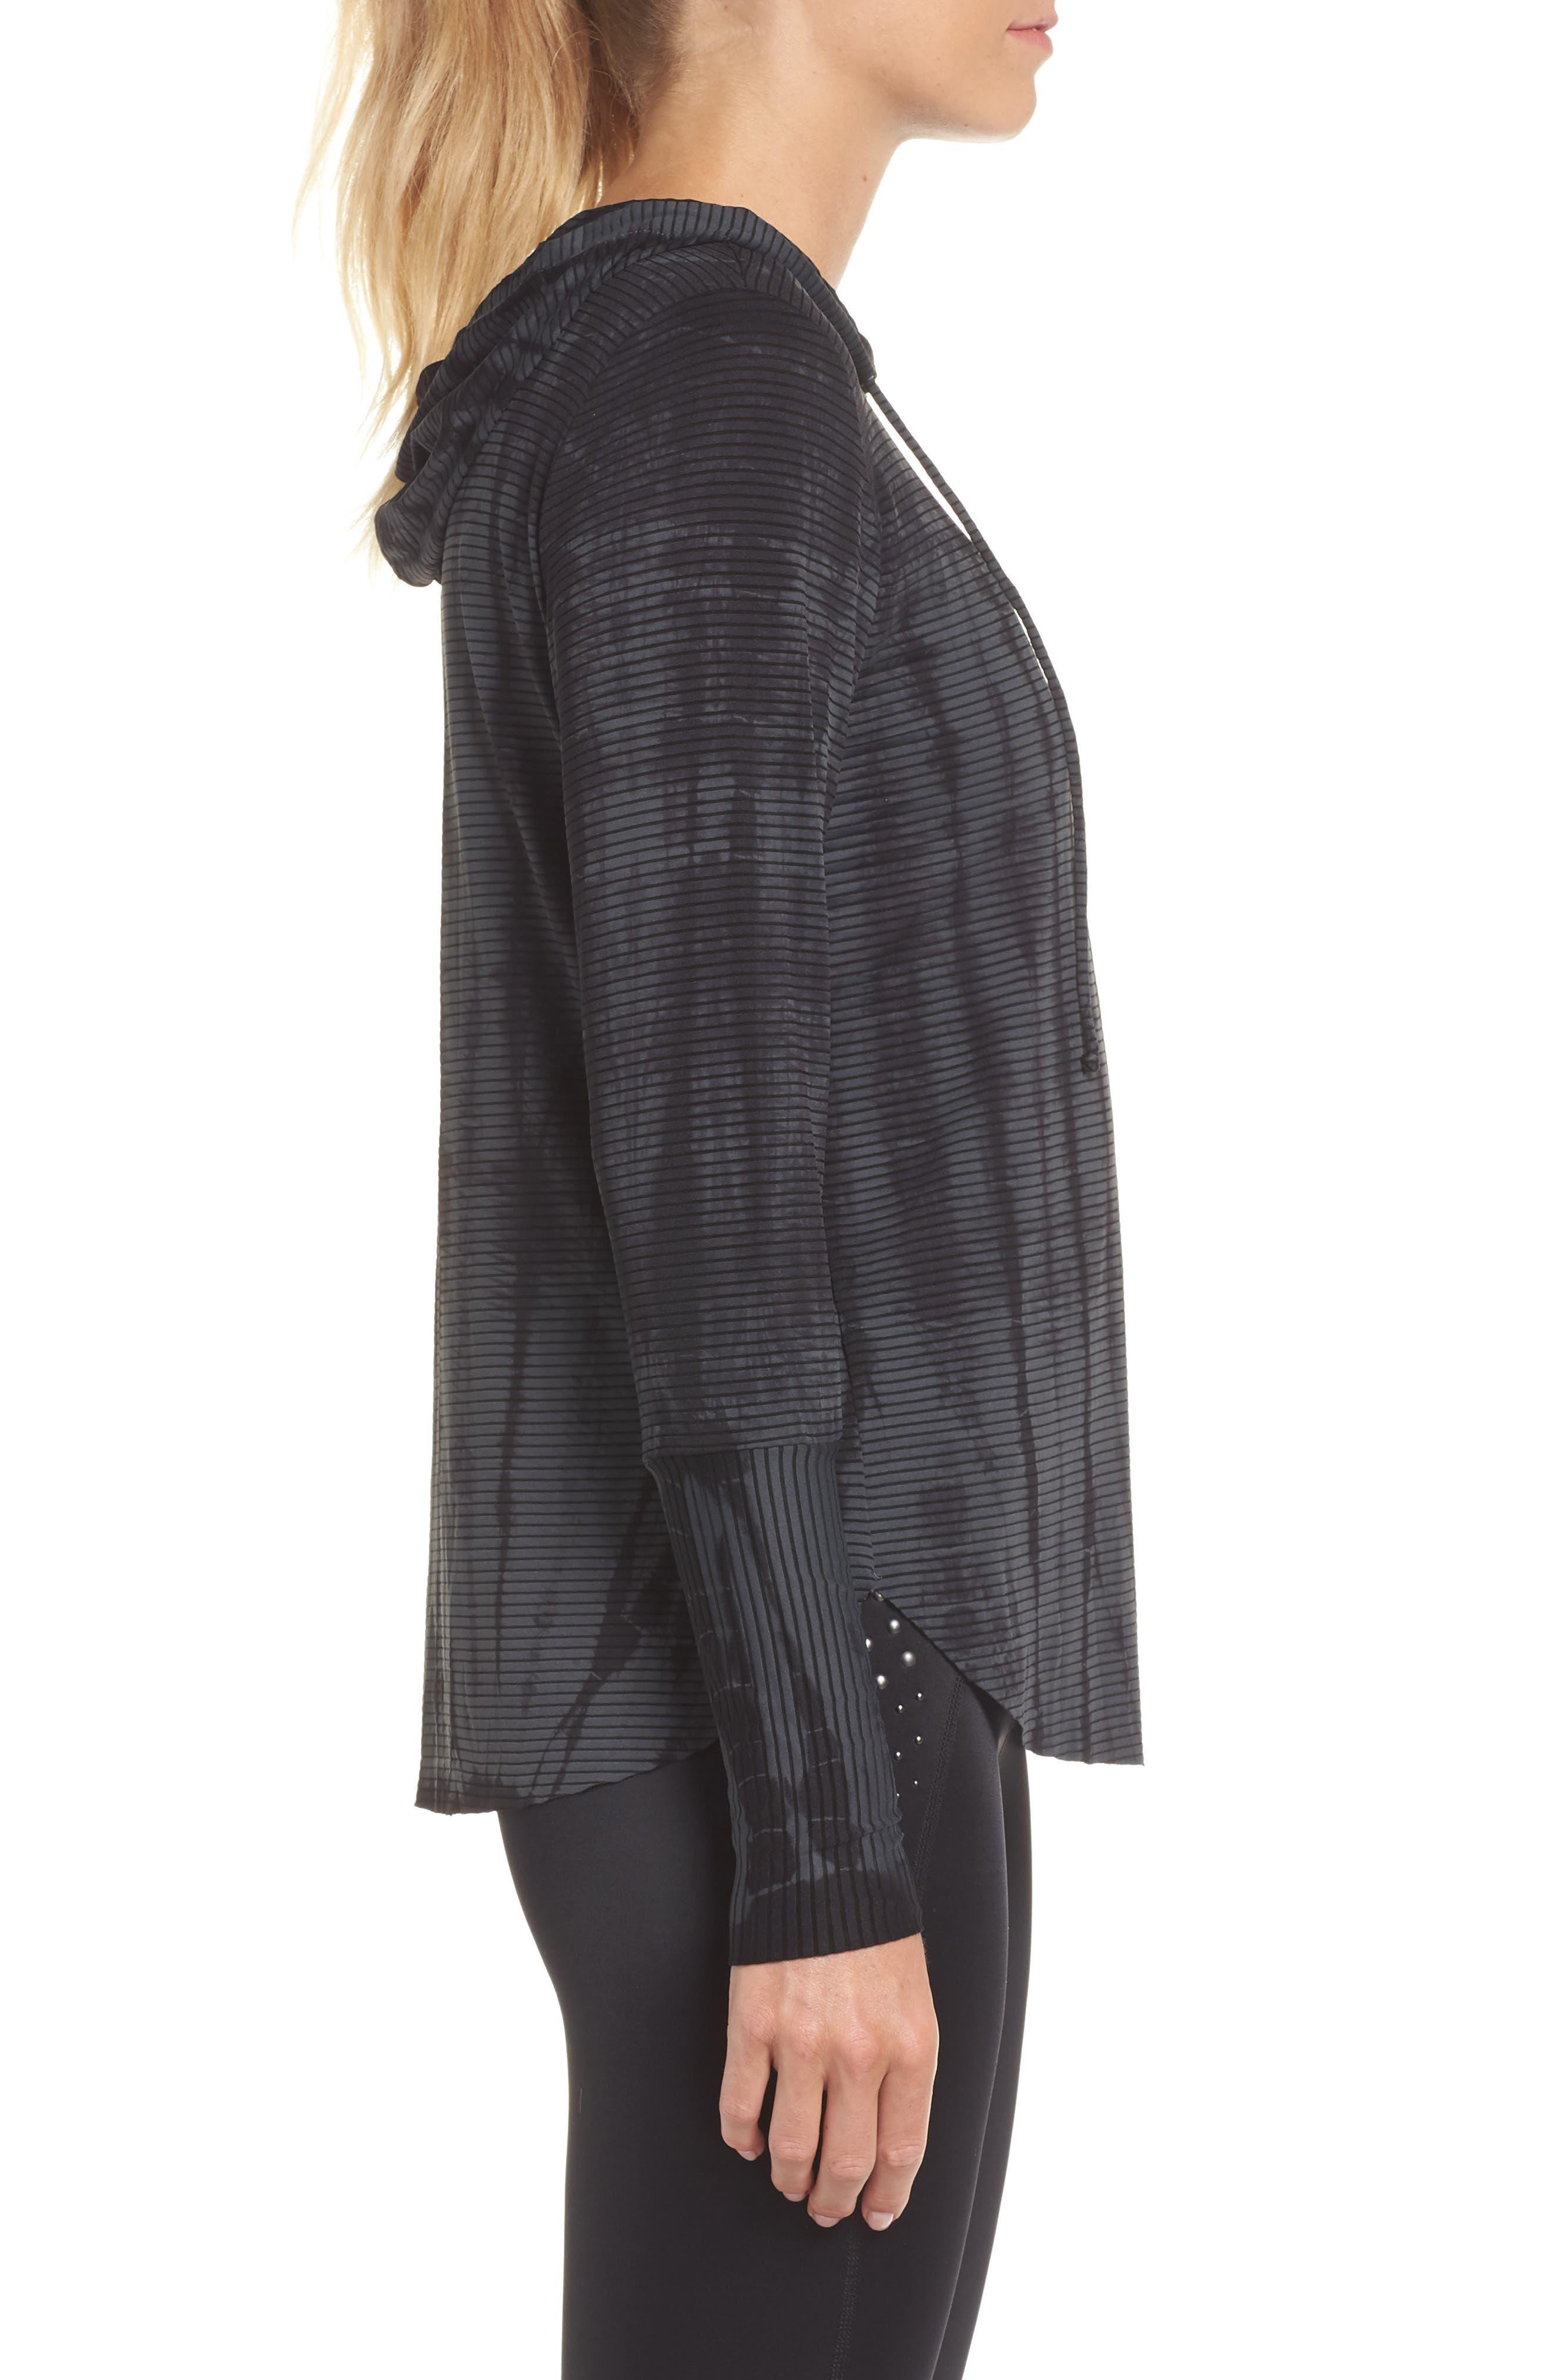 Waves Tie Dye Gray Hooded Pullover,                             Alternate thumbnail 3, color,                             DARK GREY